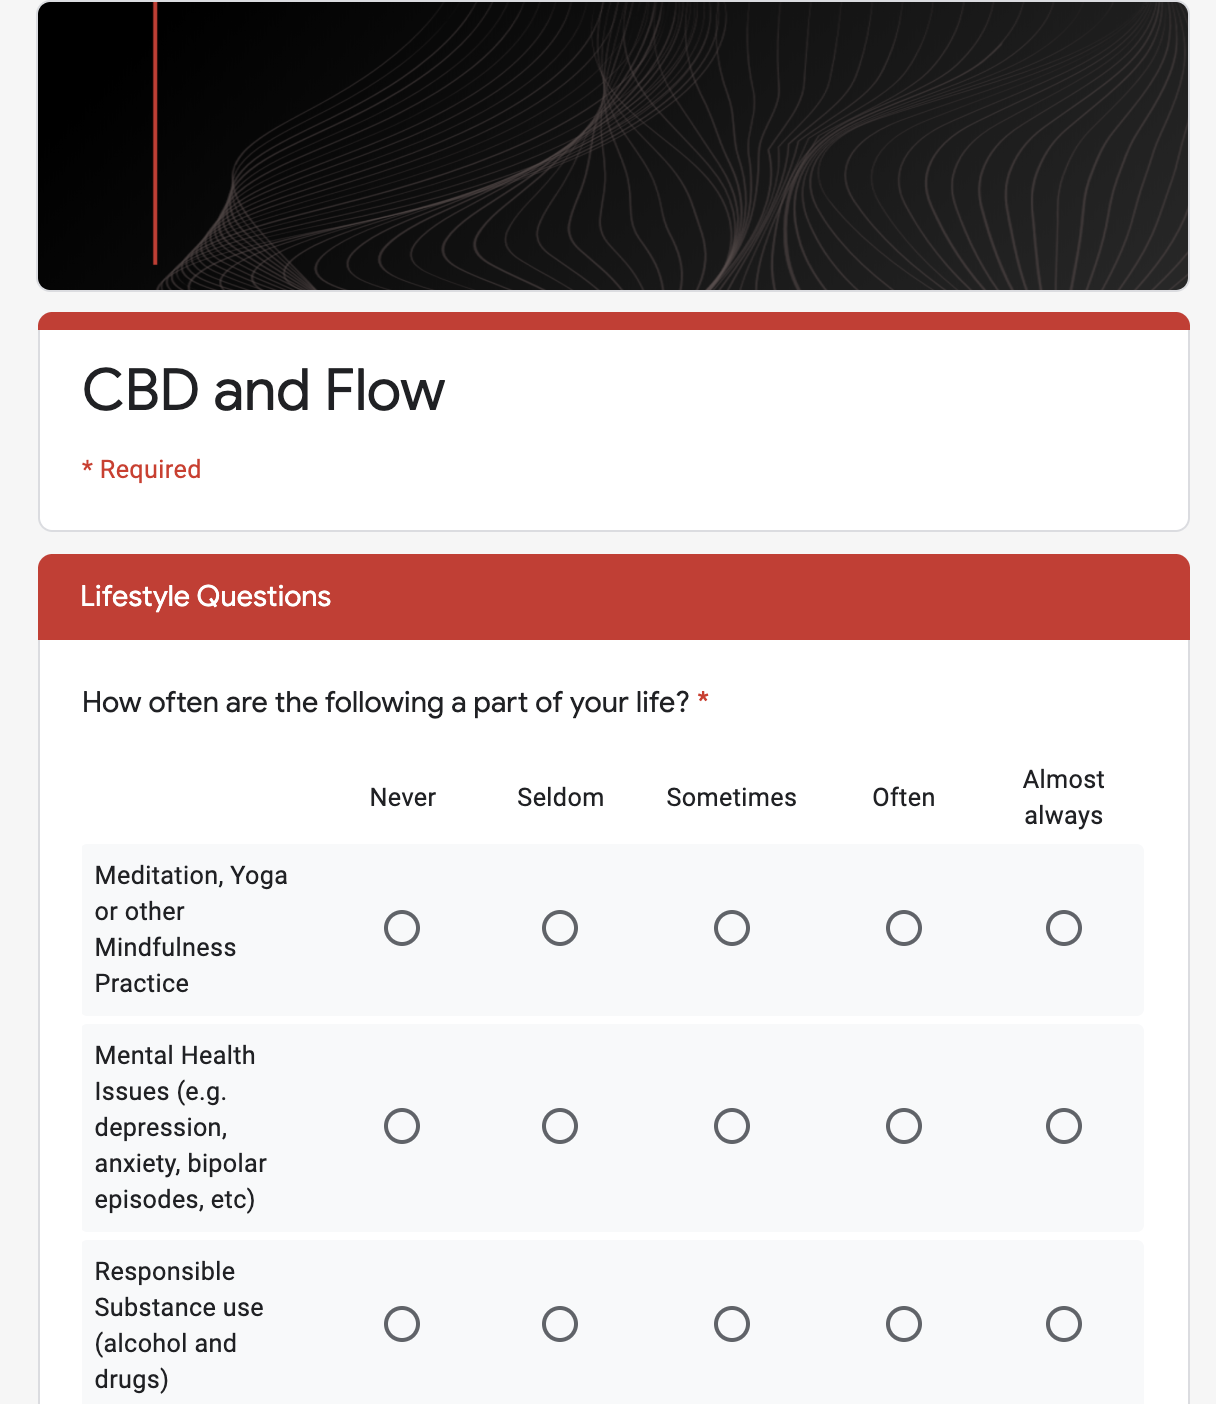 CBD and Flow Survey